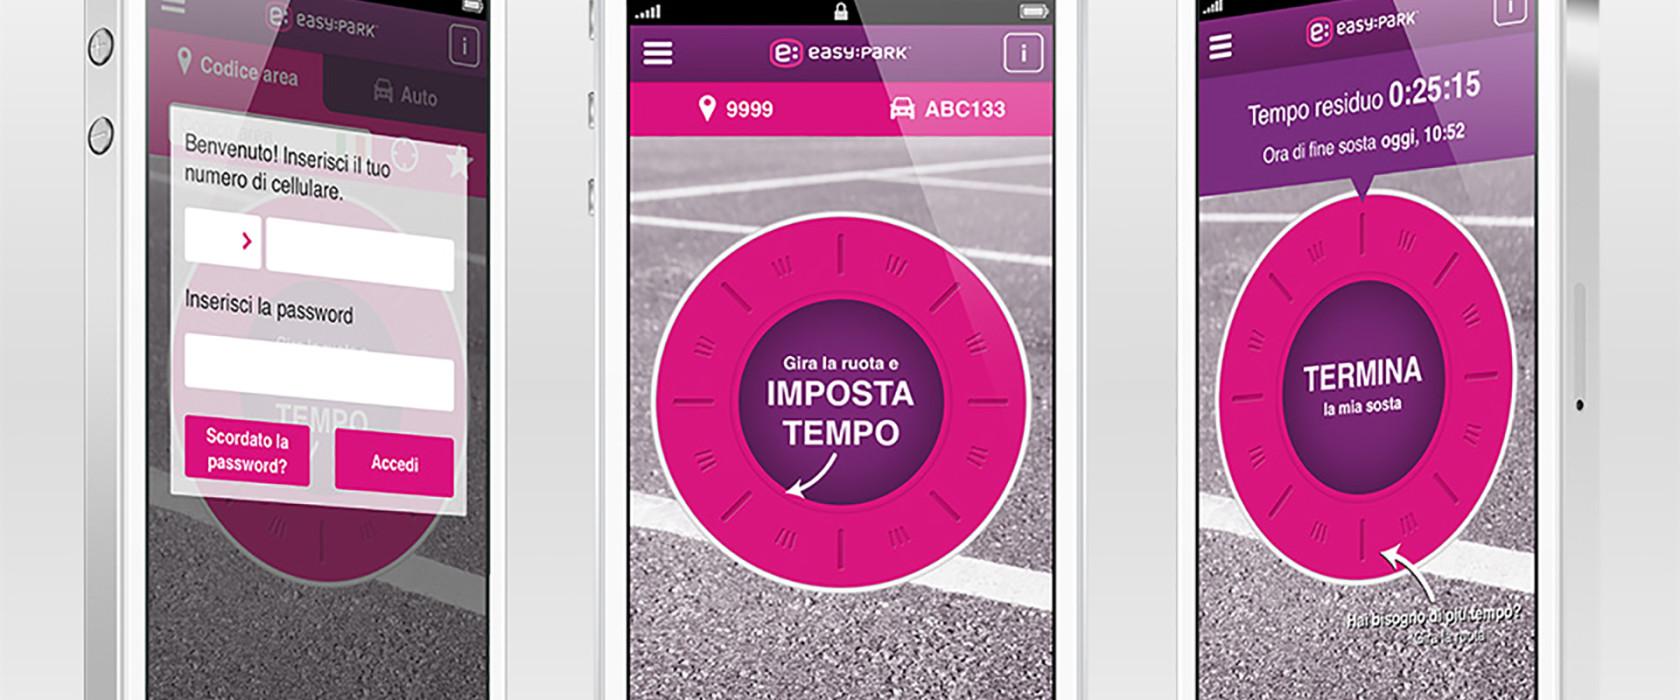 EasyPark02